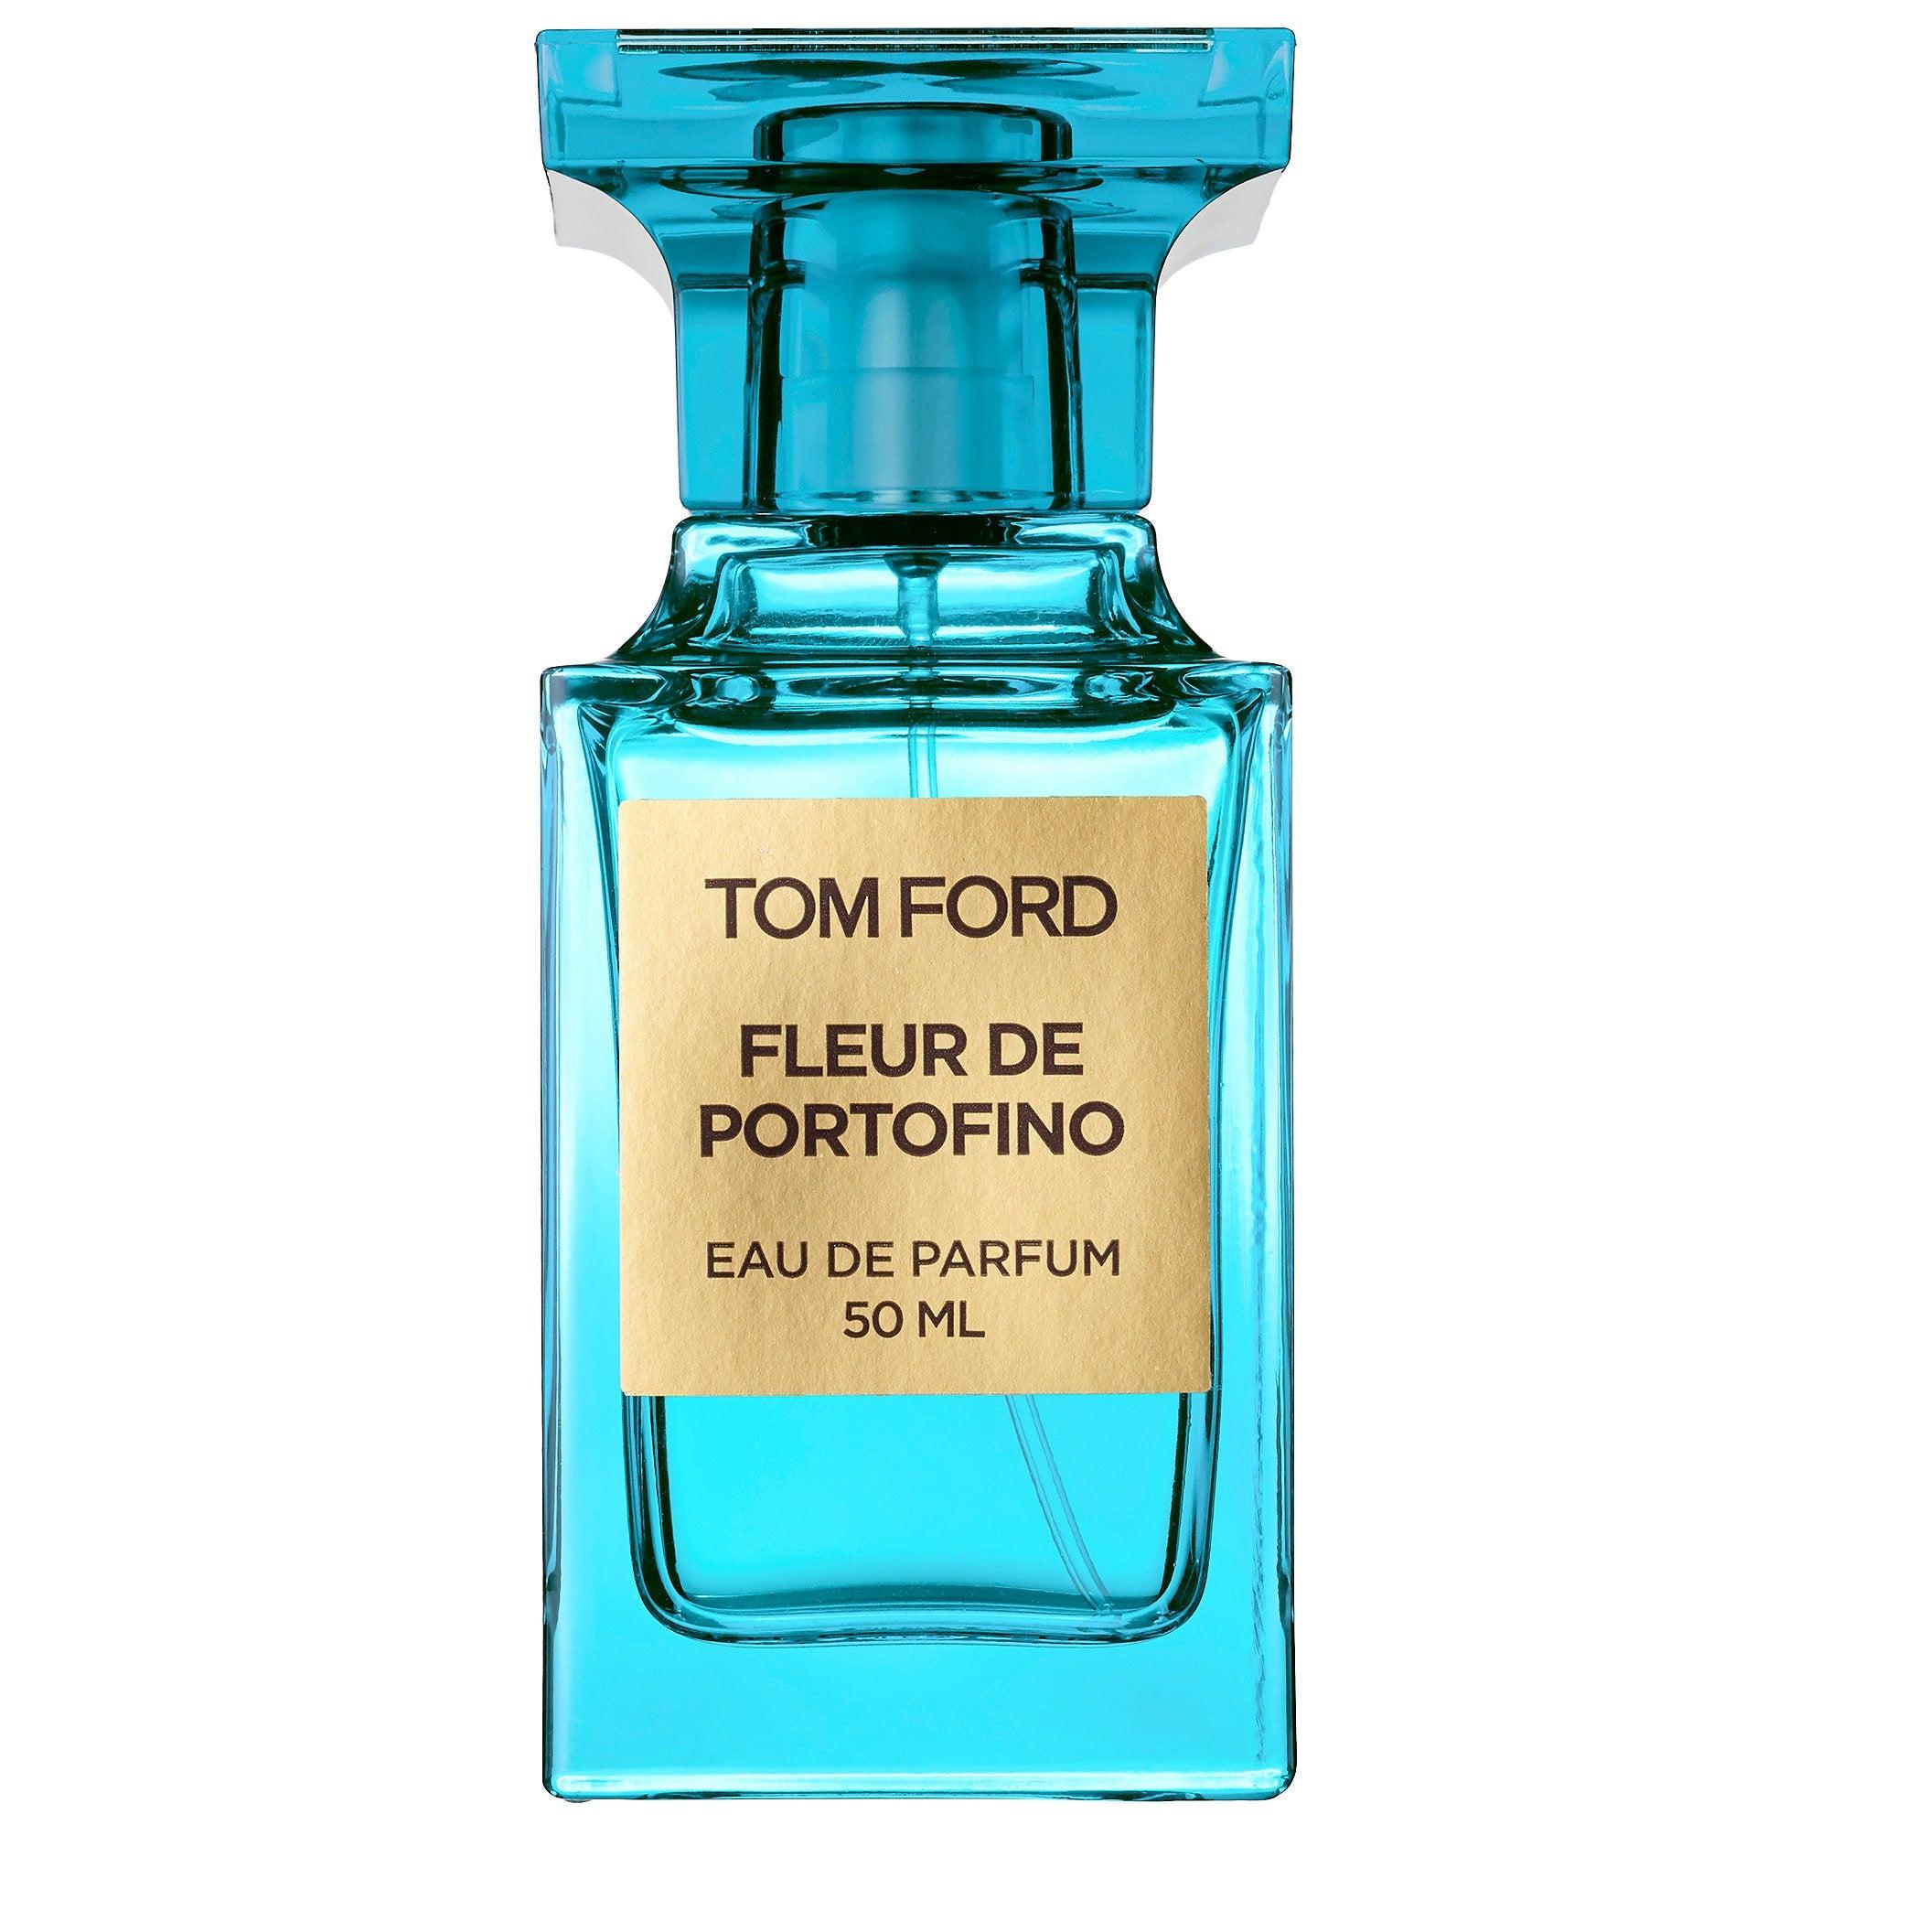 Tom Ford Fleur De Portofino Unisex Cologne